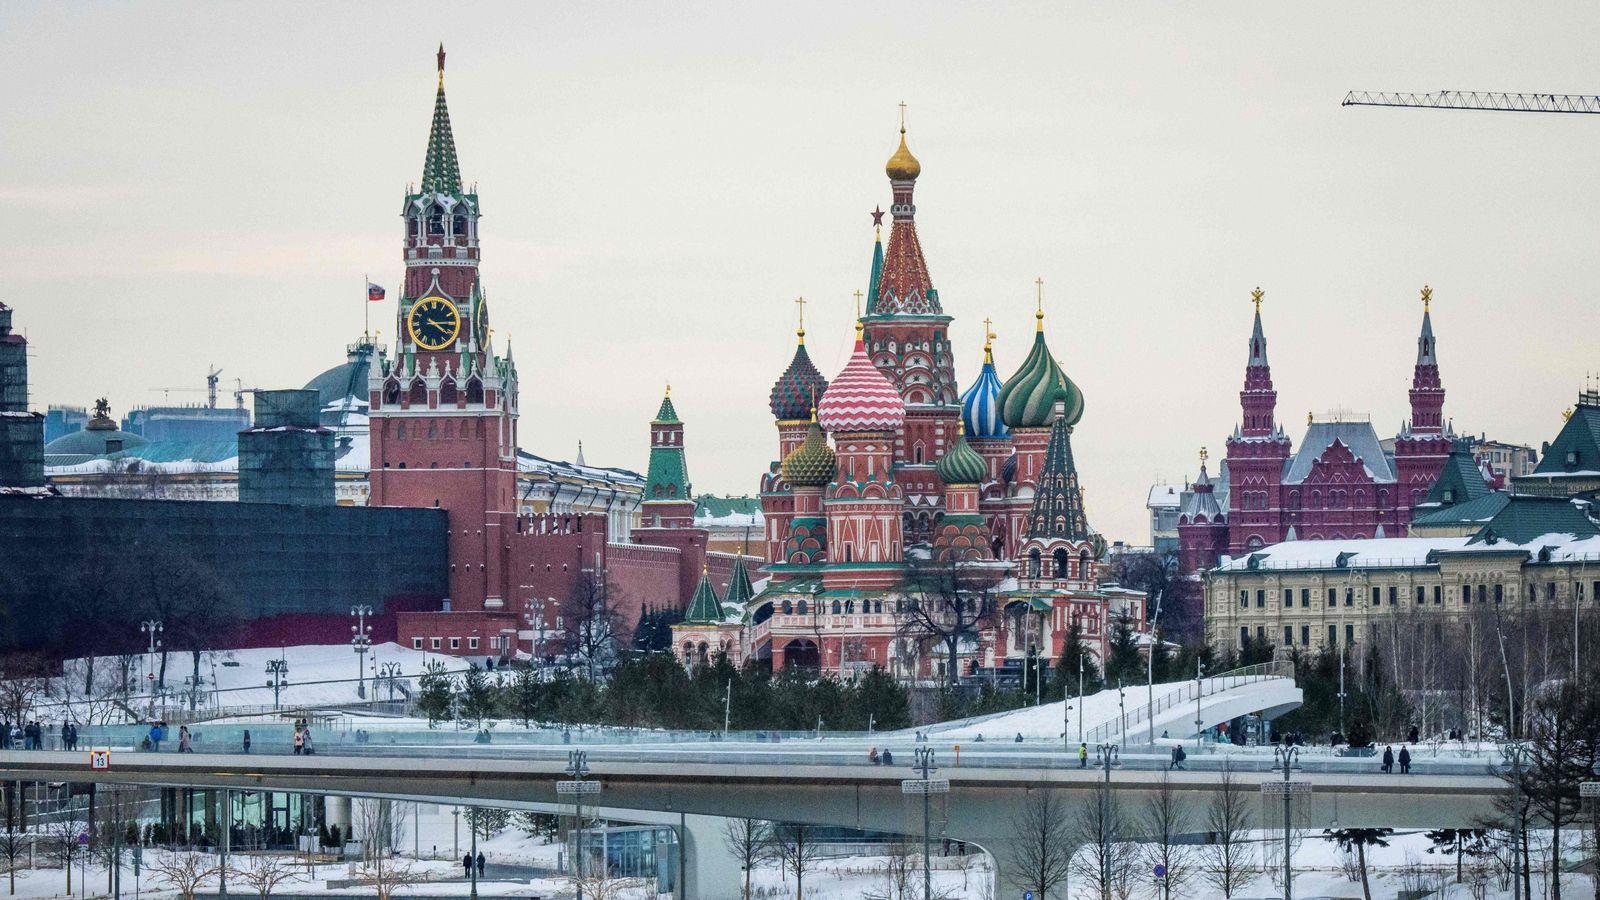 Money - Russia.com |Money From Russia